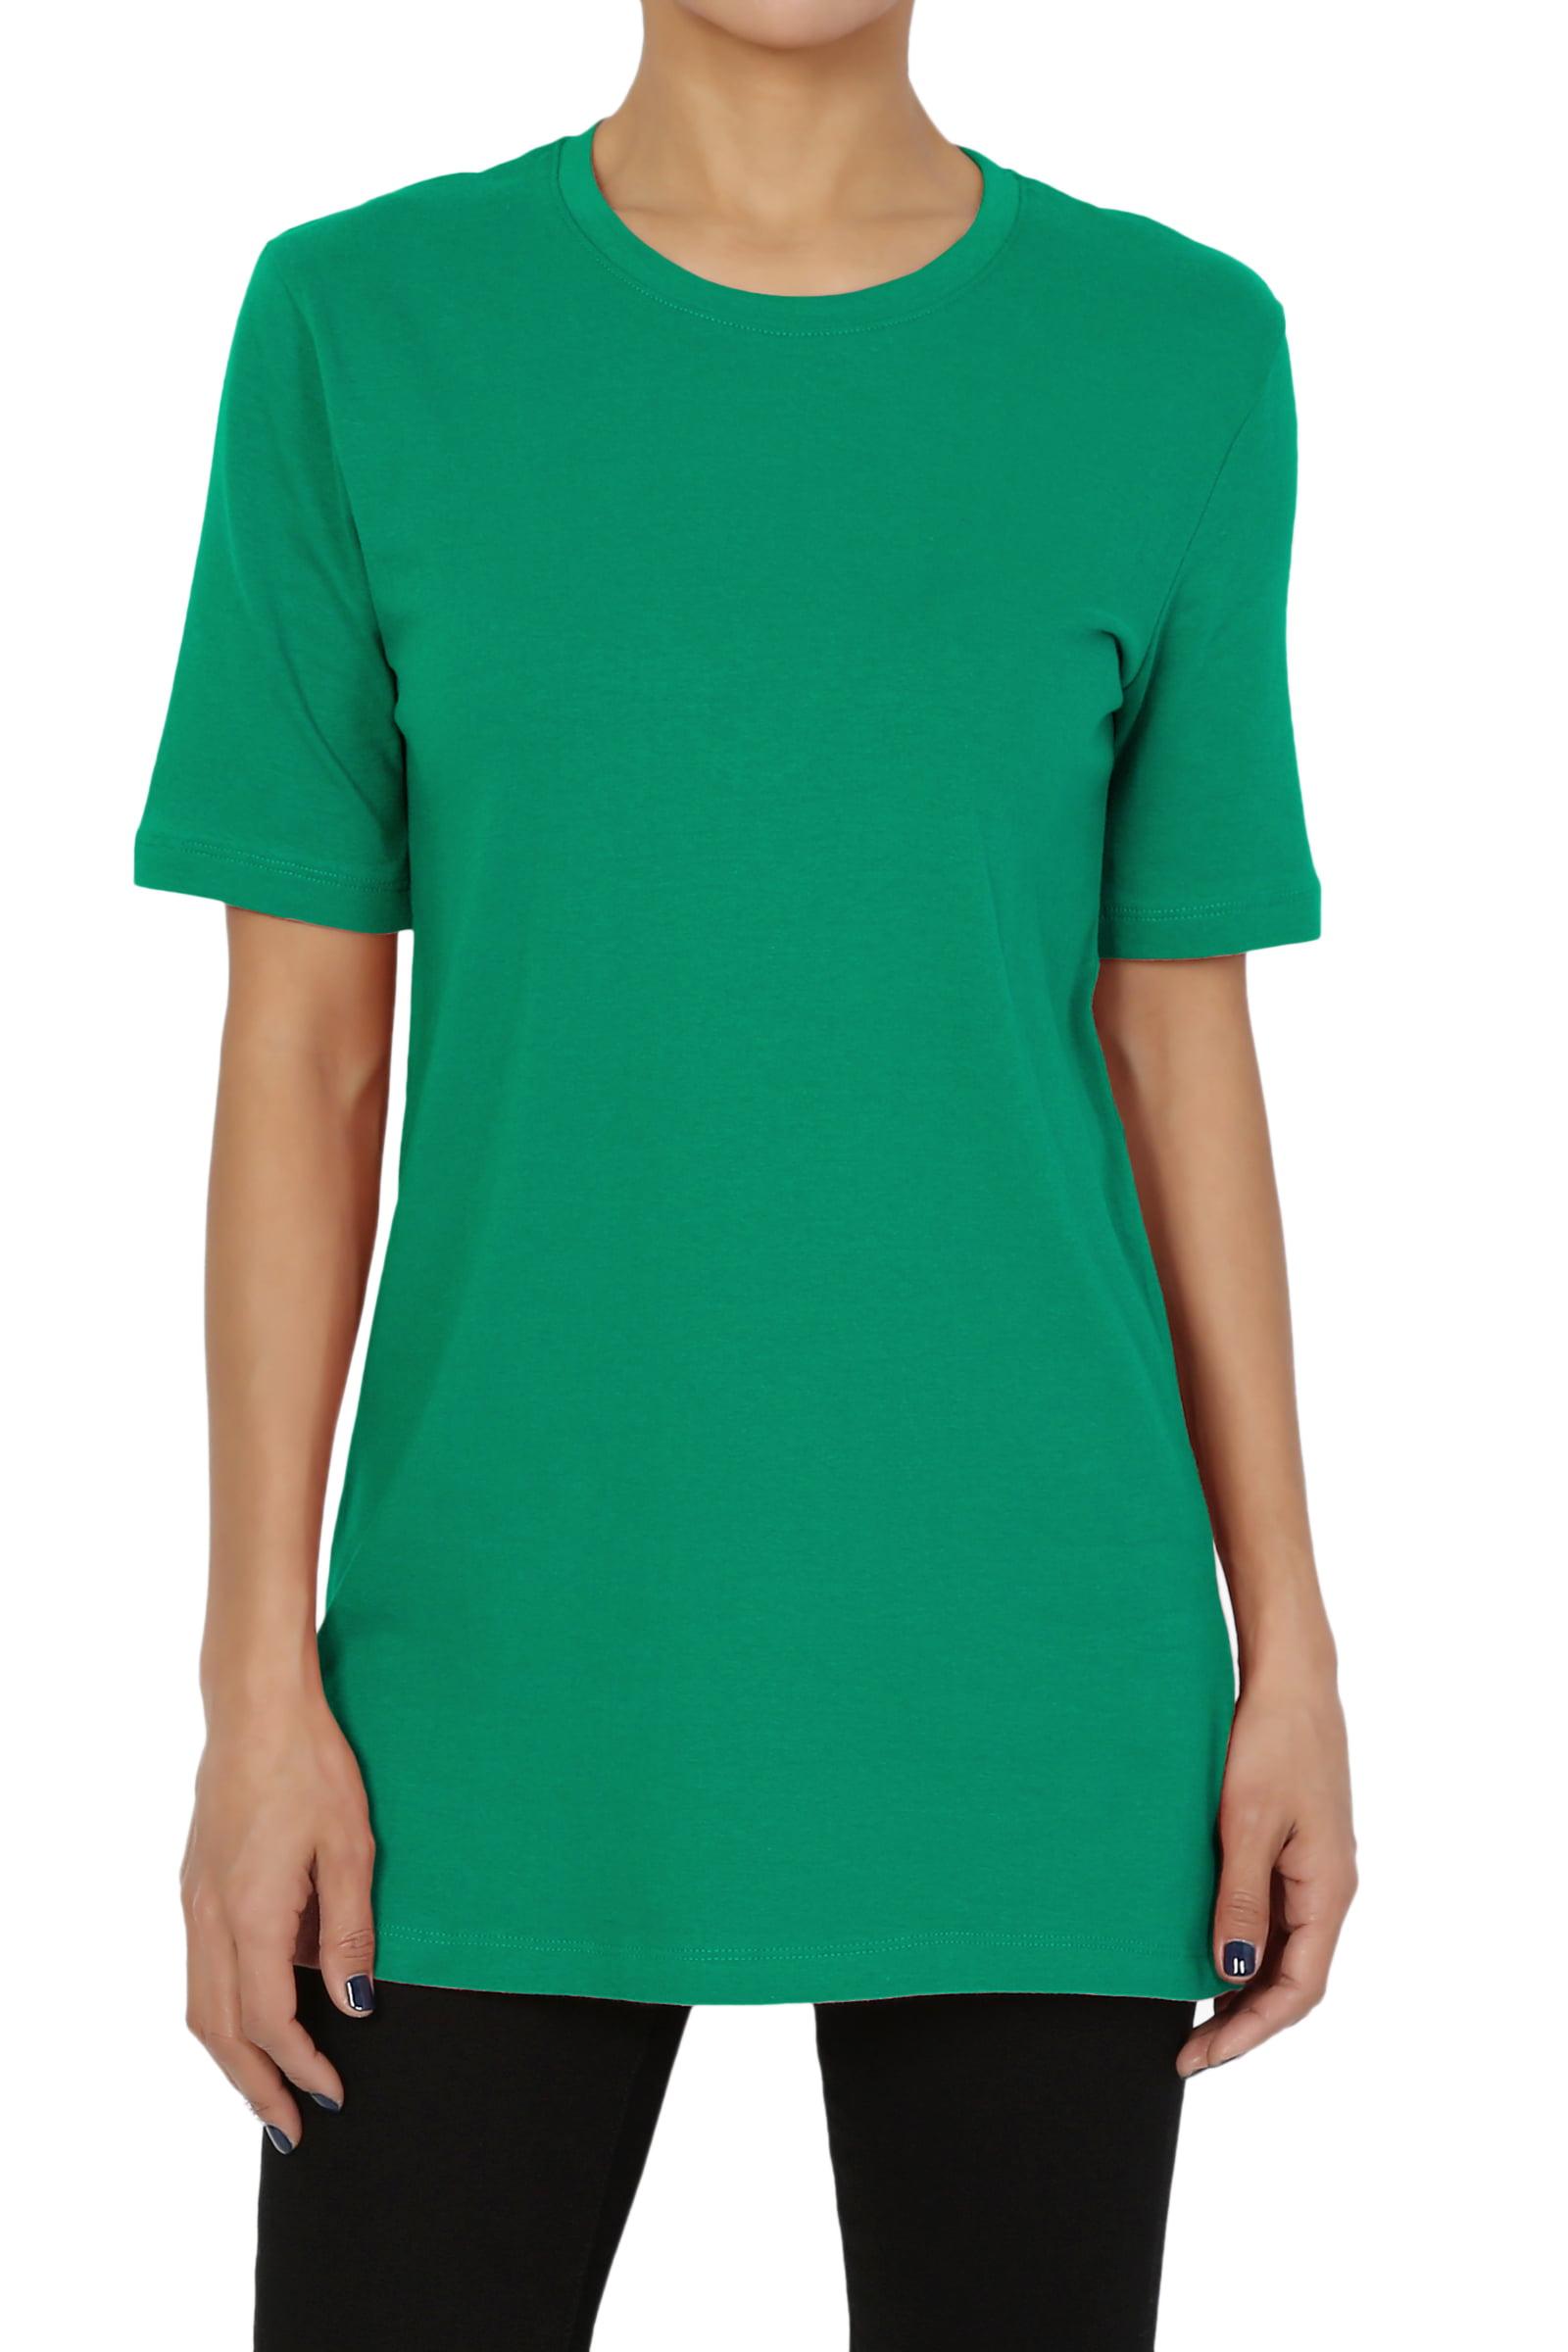 Girls Short Sleeve Retro Style Hockey Silhouette T-Shirts XS-XL Fashion Tunic Shirt Dress